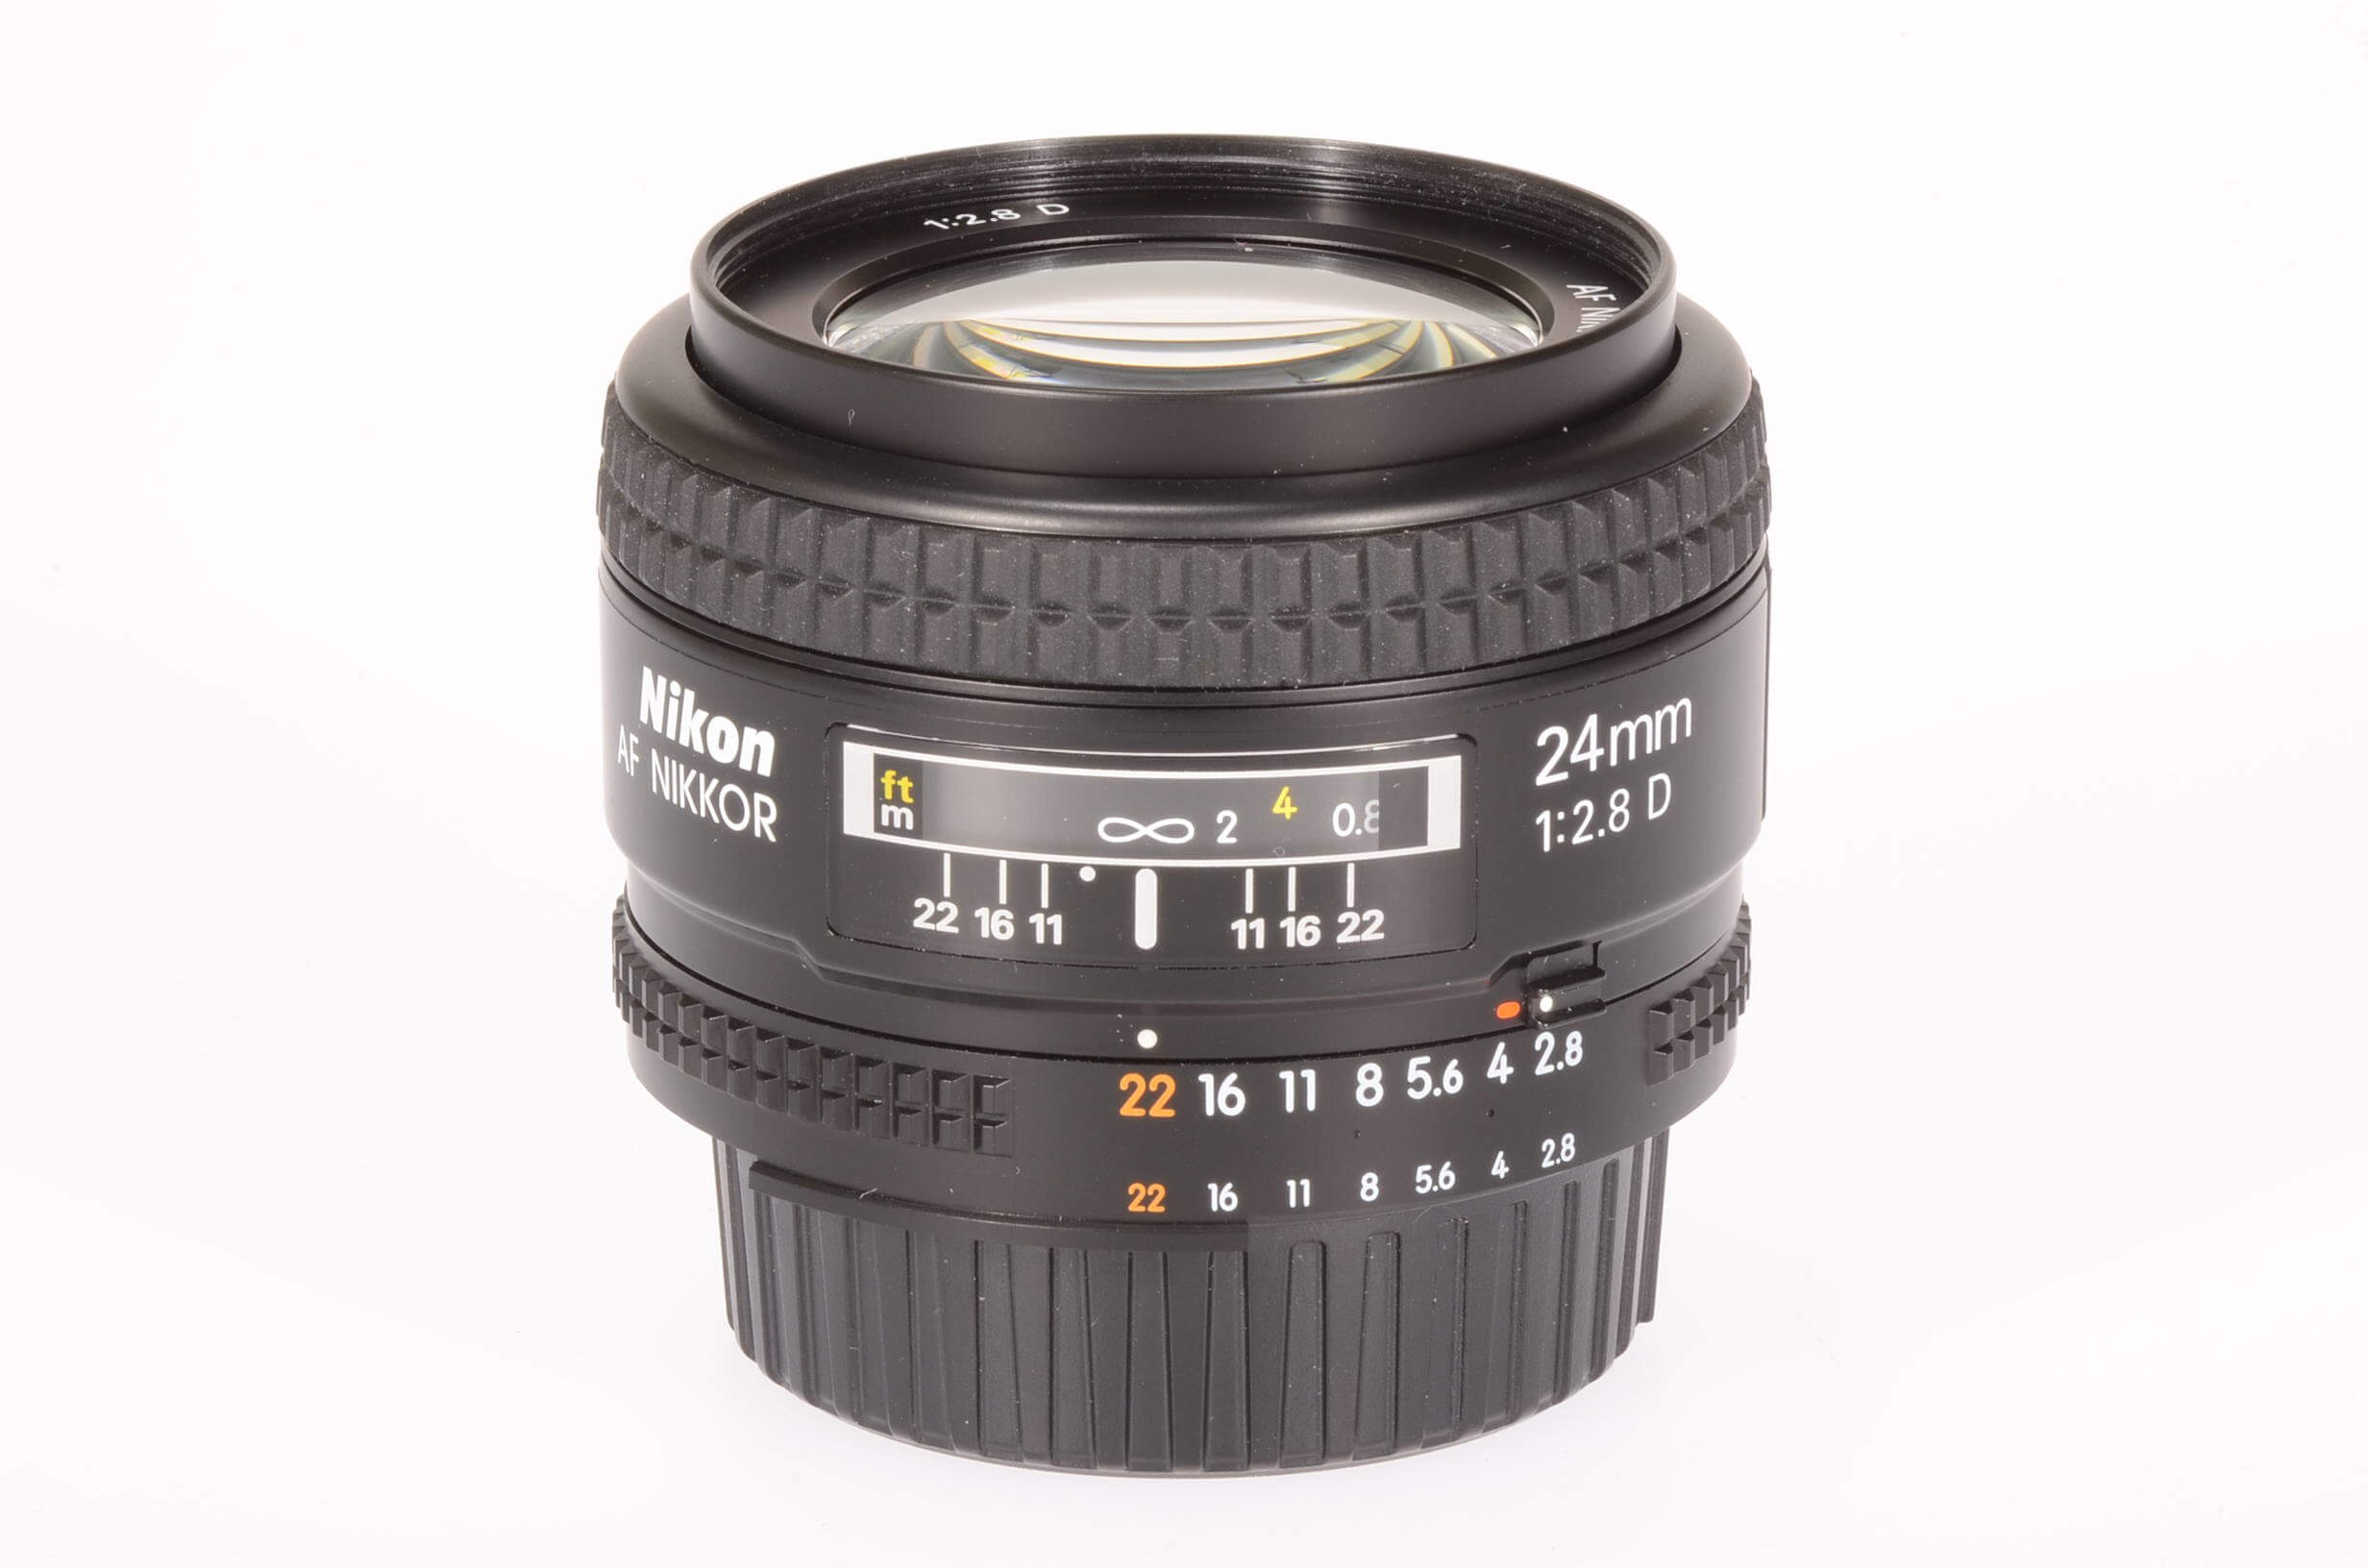 Nikon 24mm f2.8 AF D, boxed and 100% mint!